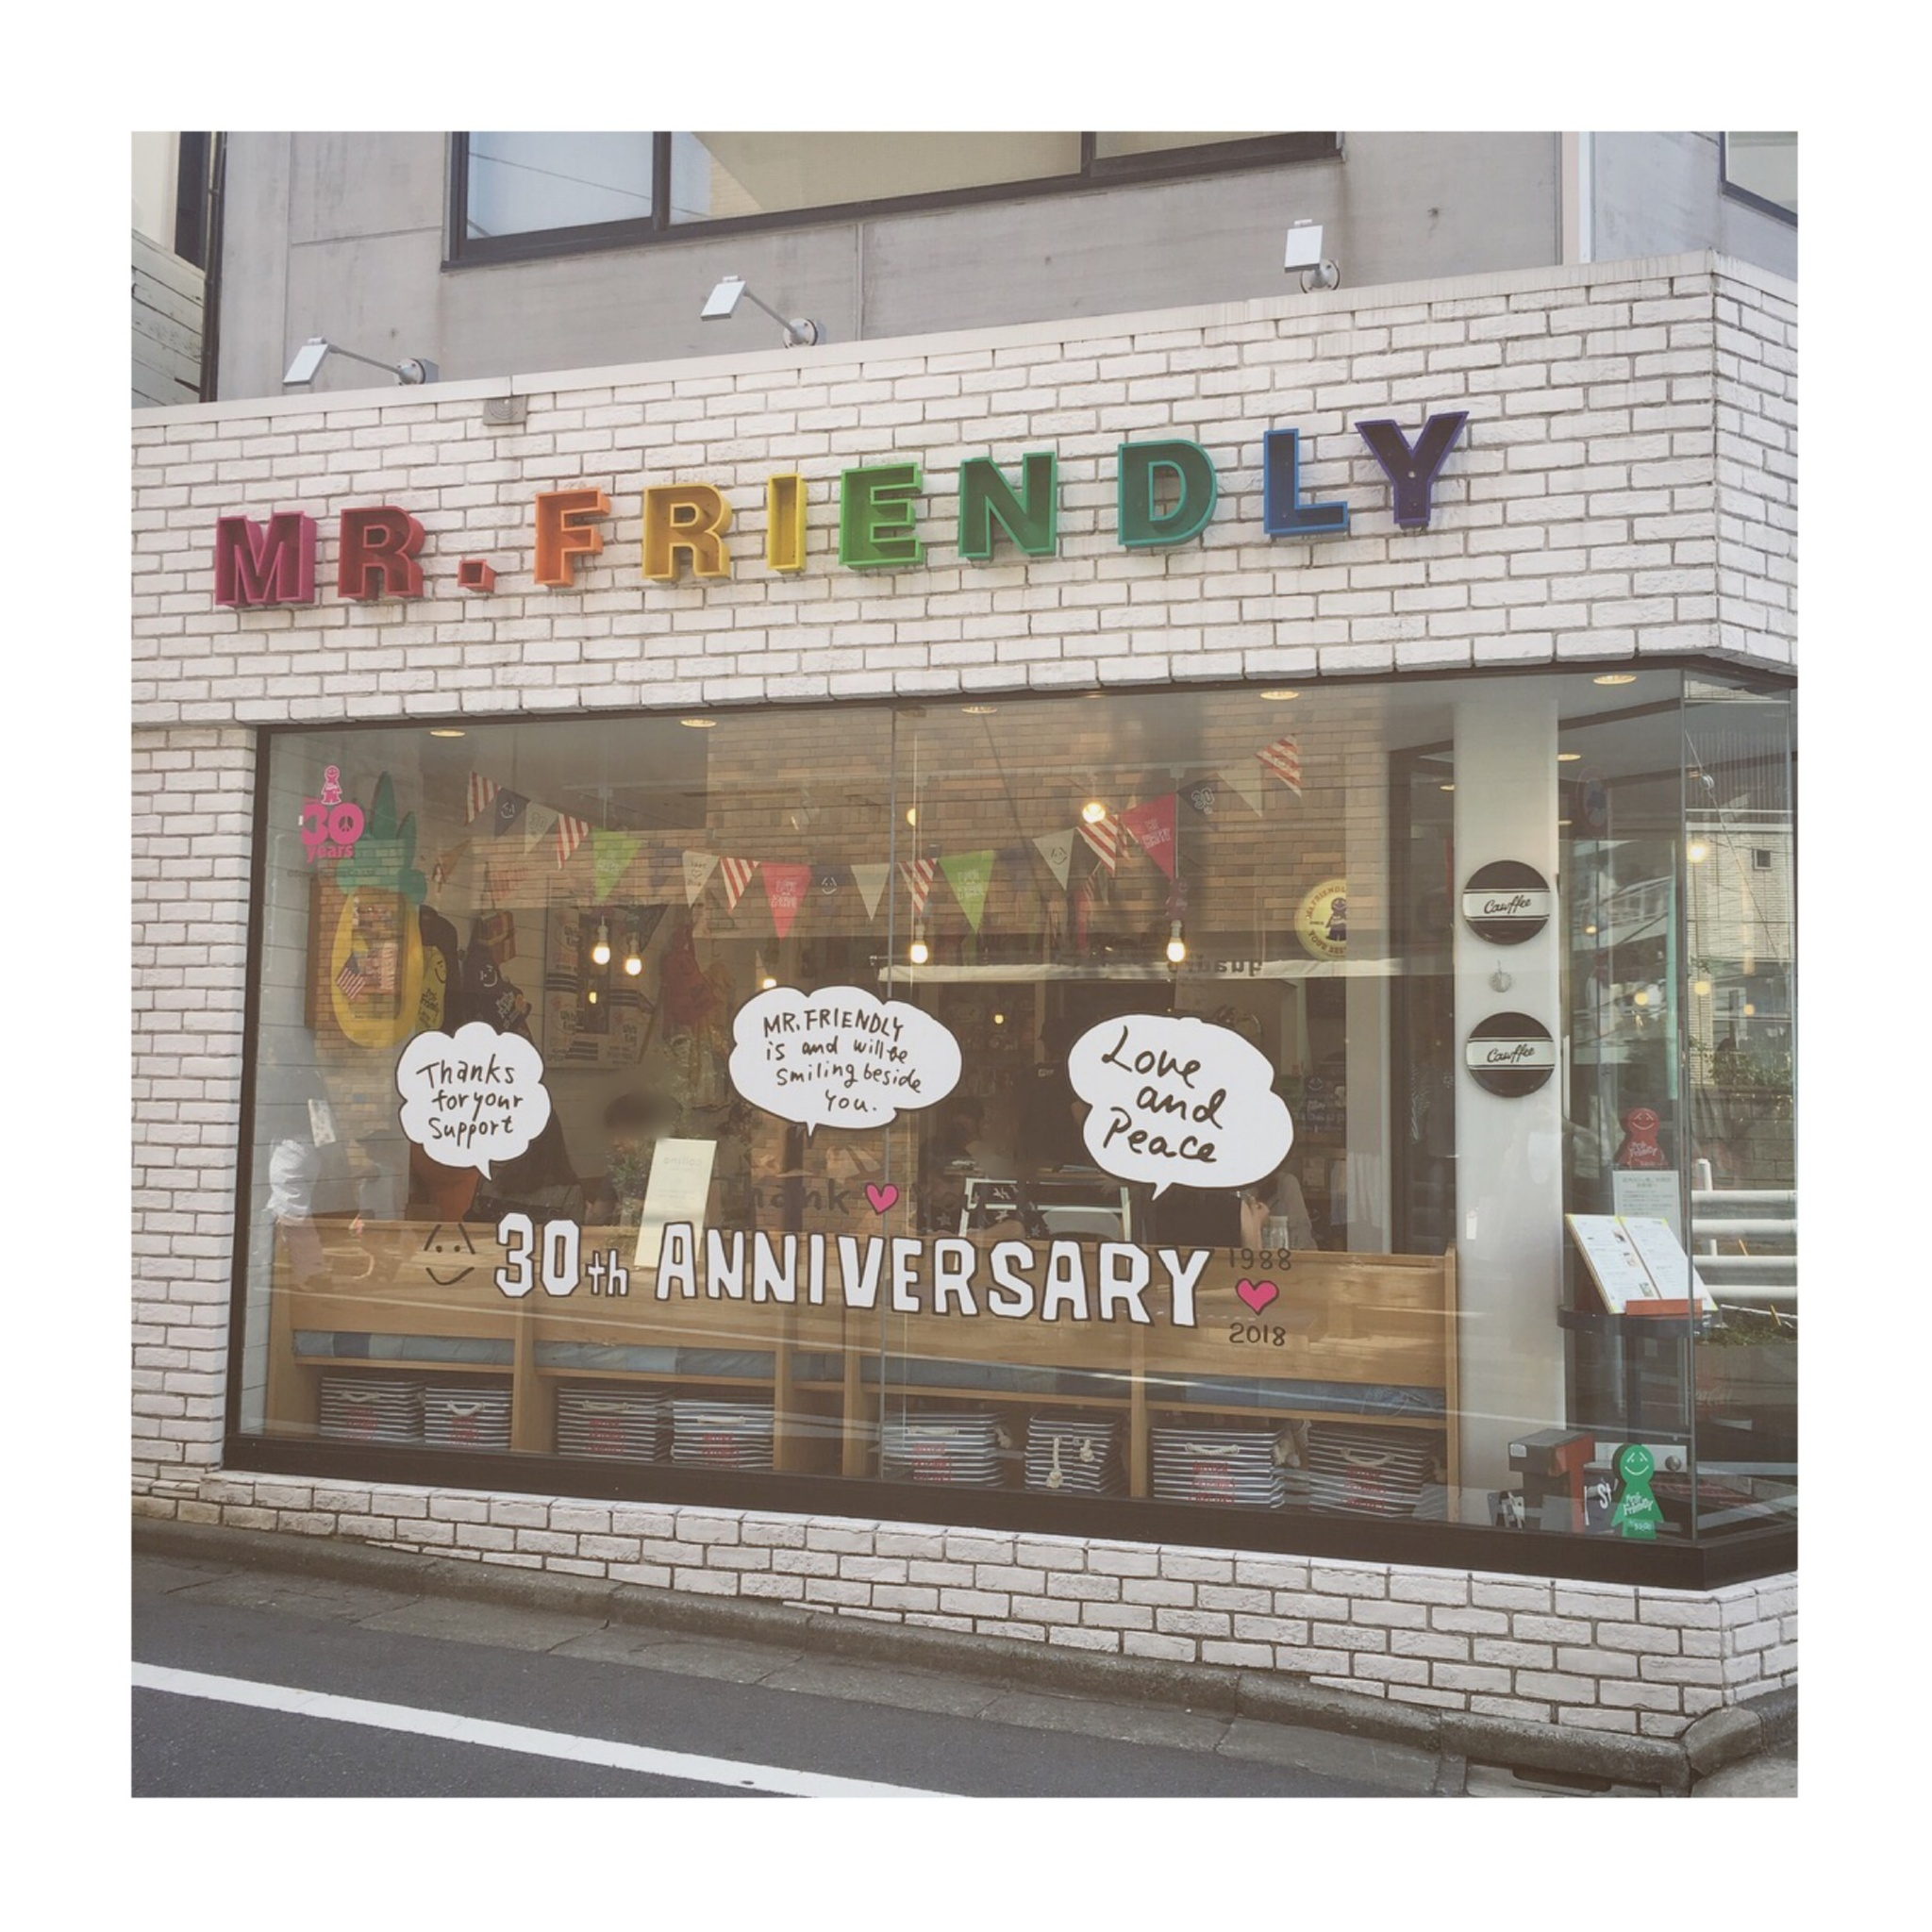 #3【#cafestagram】❤️:お店の中から外までとにかくかわいい!《代官山》MR. FRIENDLY CAFE☻_1